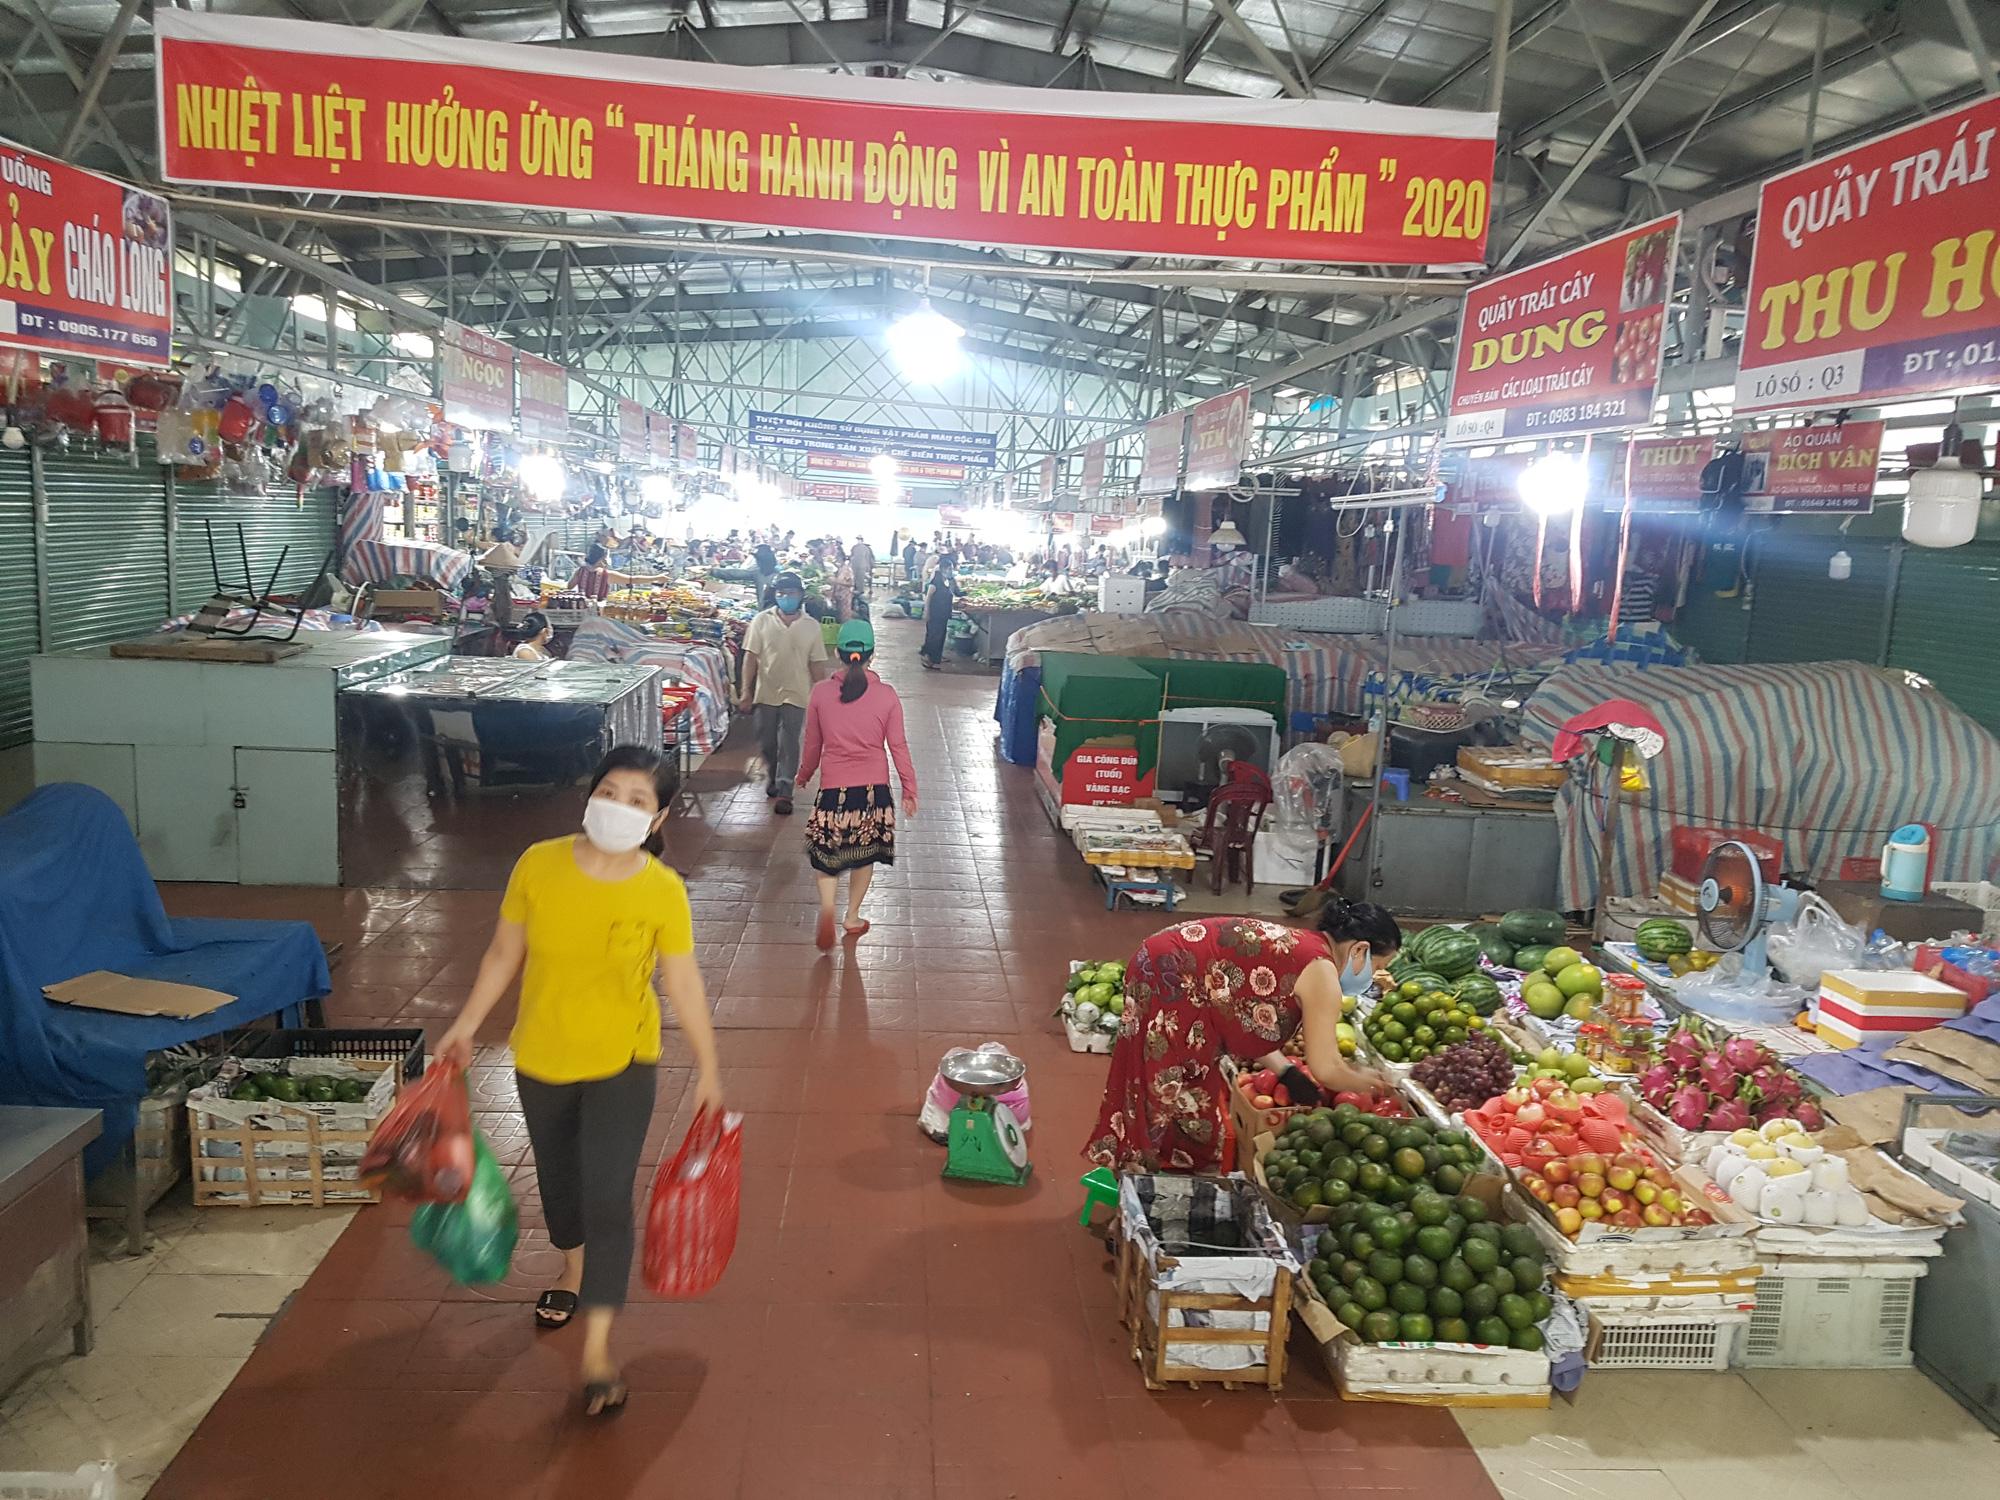 People buy supplies at a market in Da Nang City, Vietnam, August 12, 2020. Photo: Huu Kha / Tuoi Tre